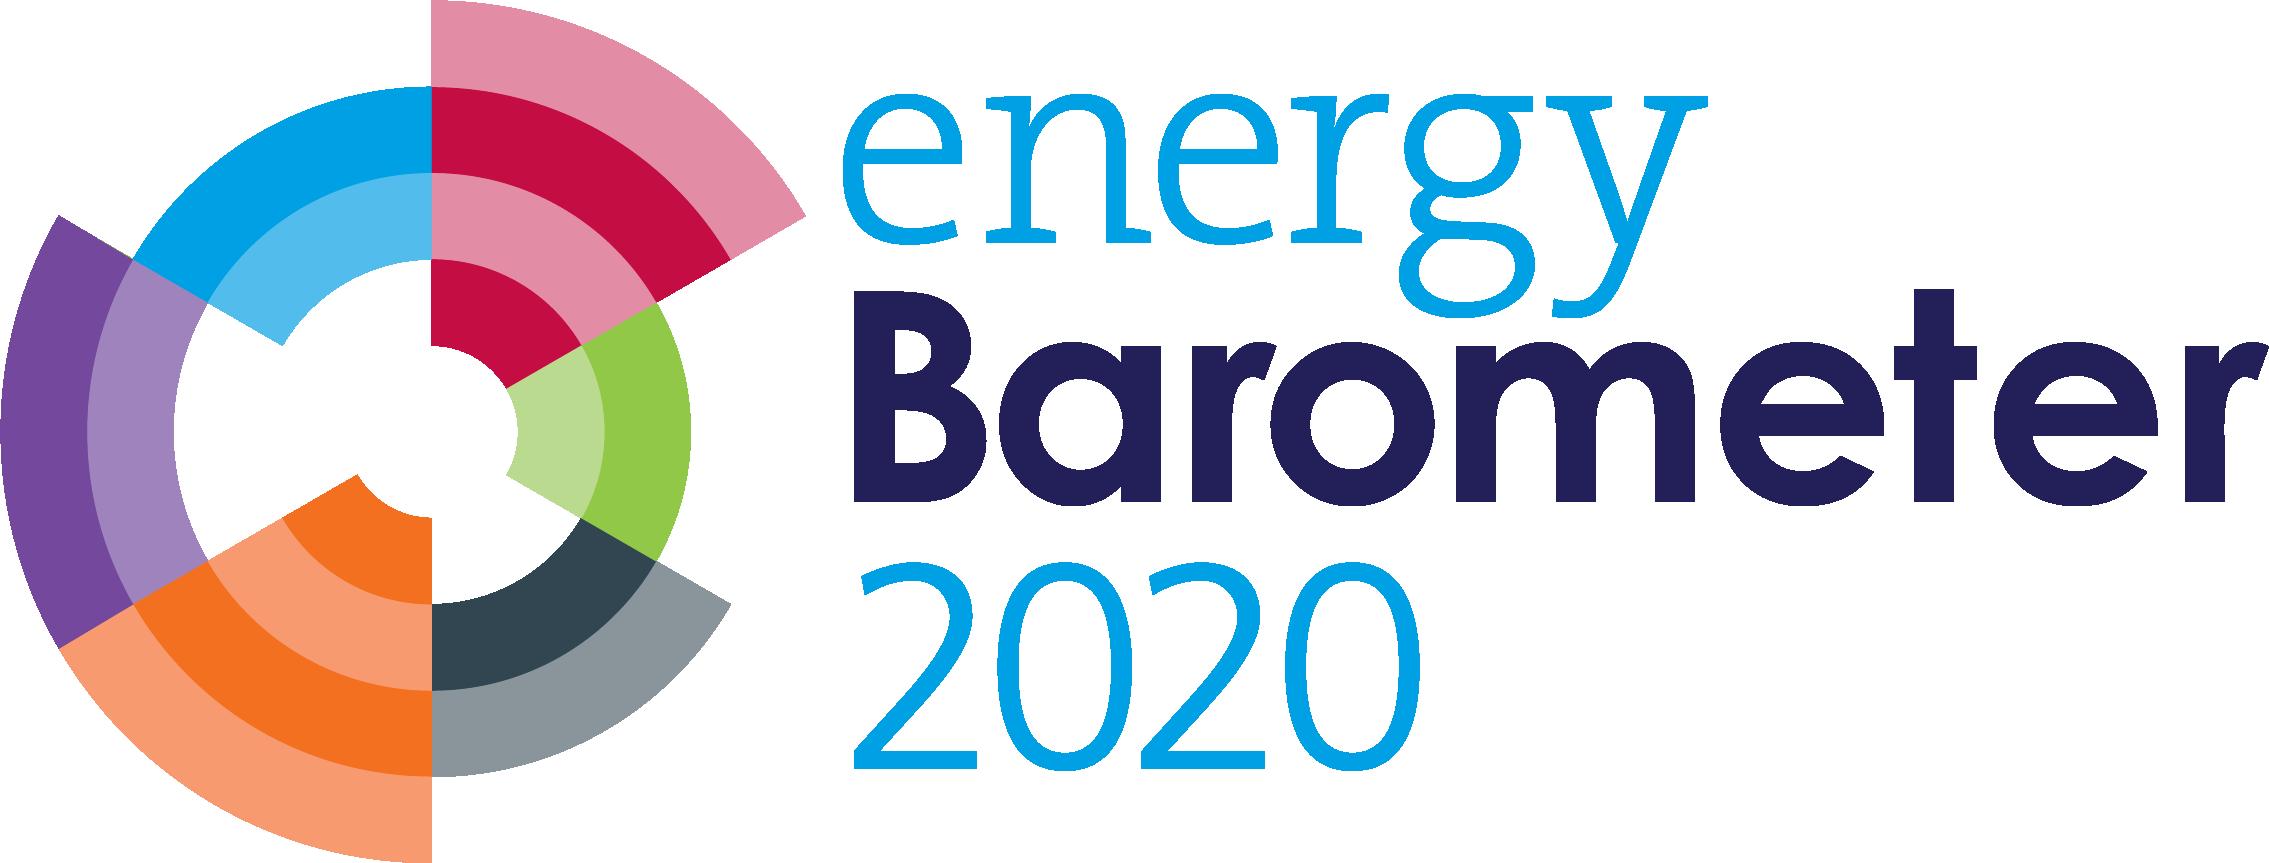 Barometer Logo